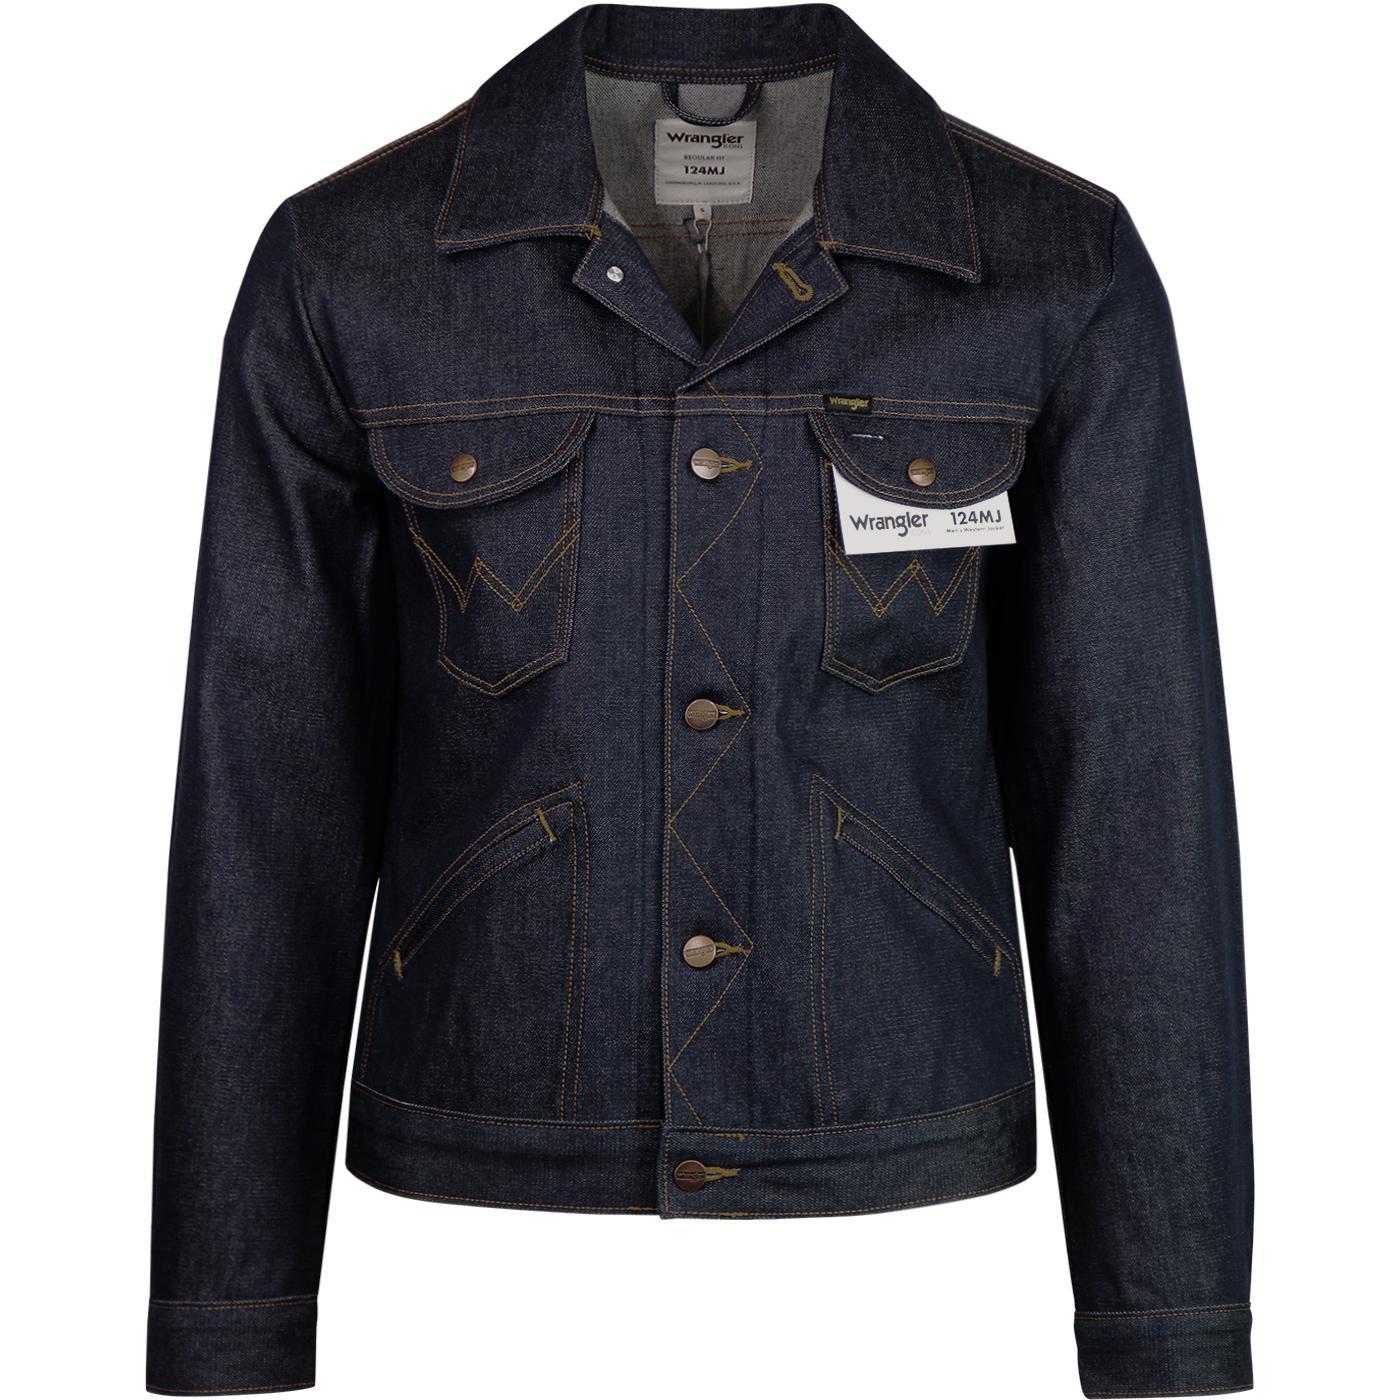 124MJ WRANGLER 60s Mod Men's Denim Western Jacket